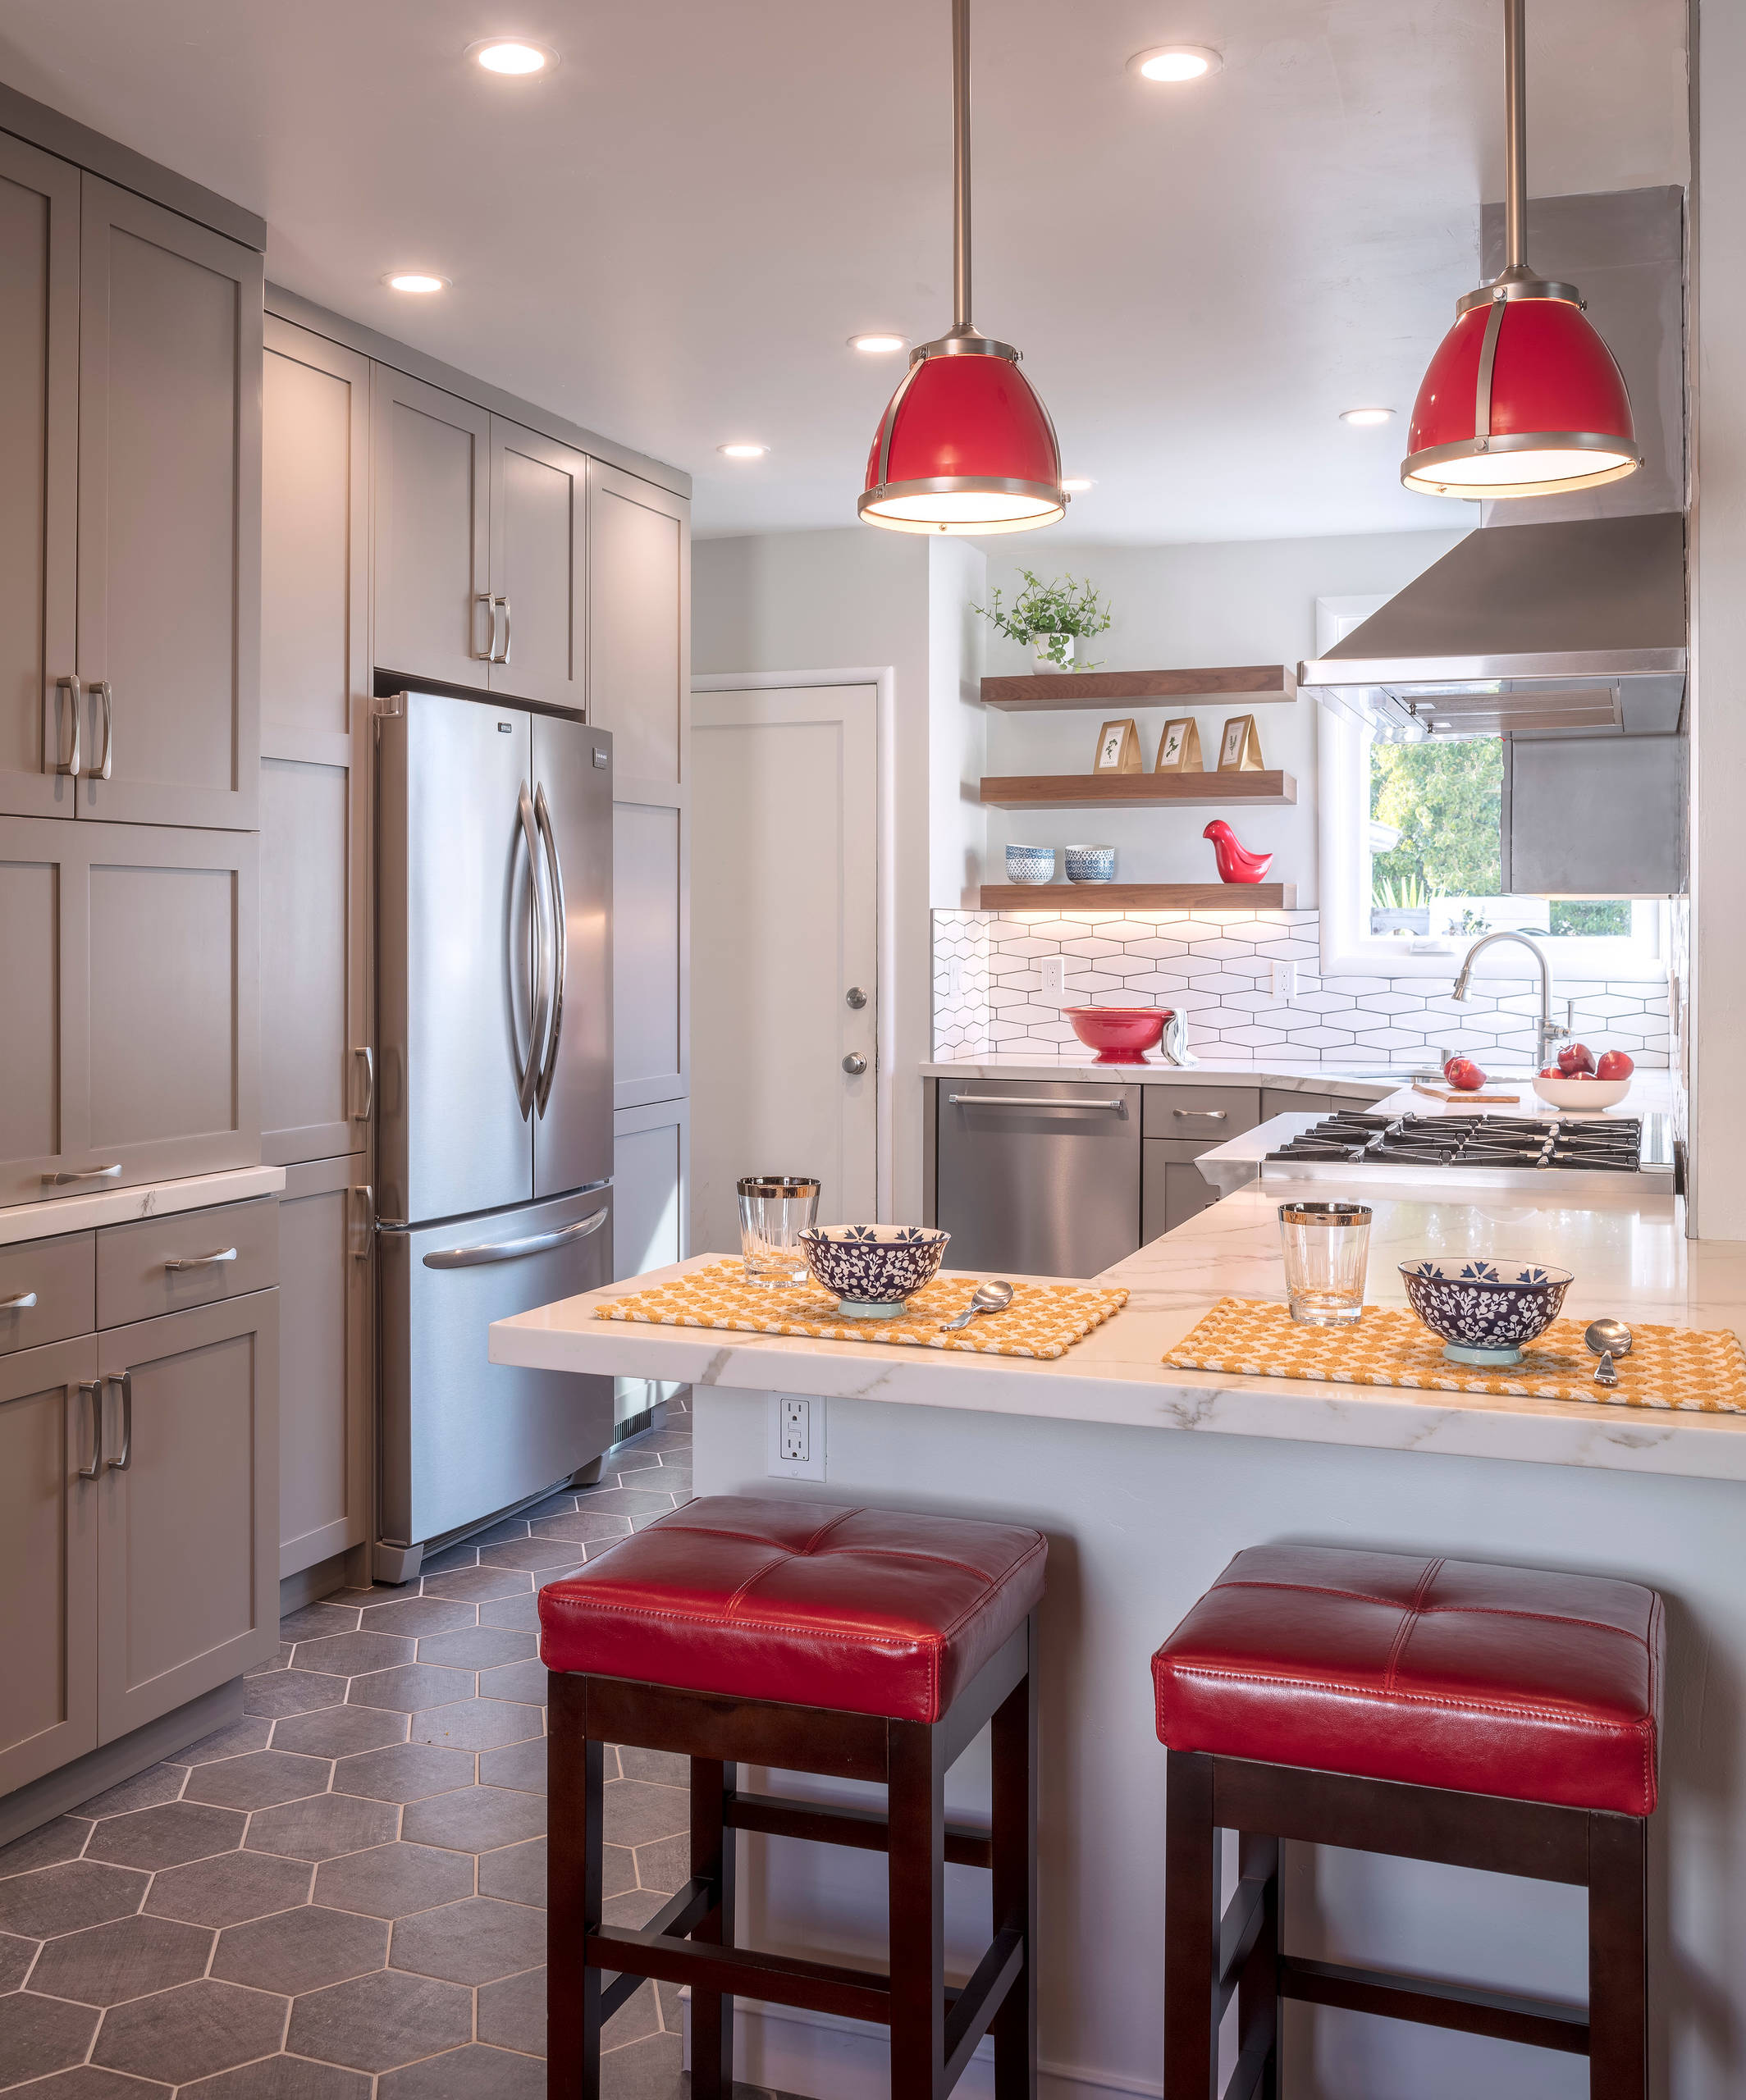 backsplash with red accent tile kitchen